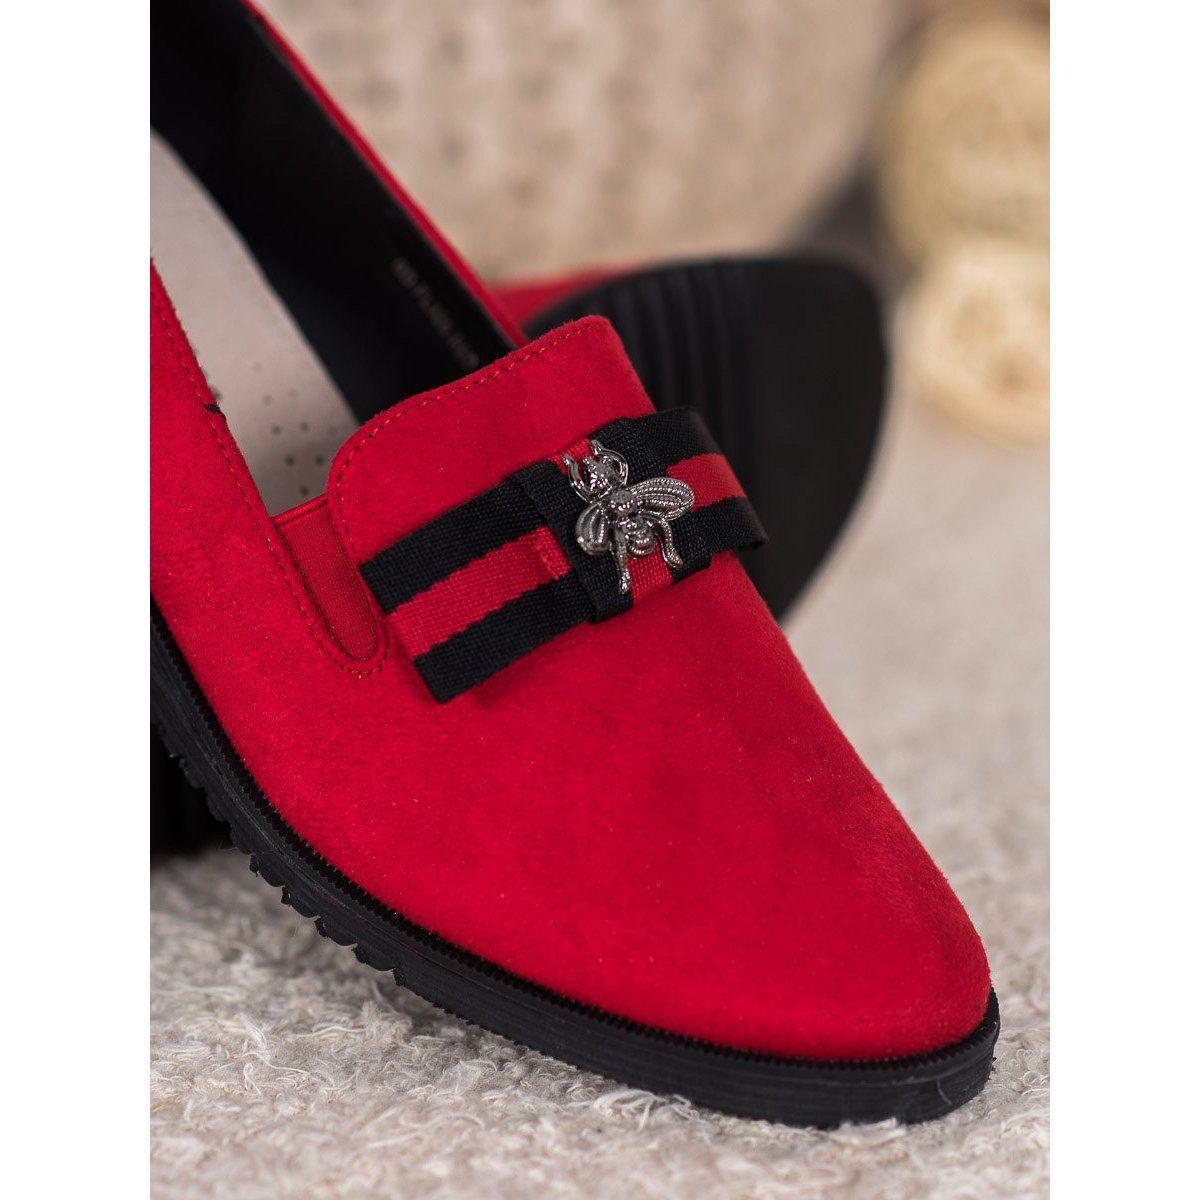 Goodin Lekkie Lordsy Z Ozdoba Czerwone Womens Heels Dress Shoes Men Leather Heels